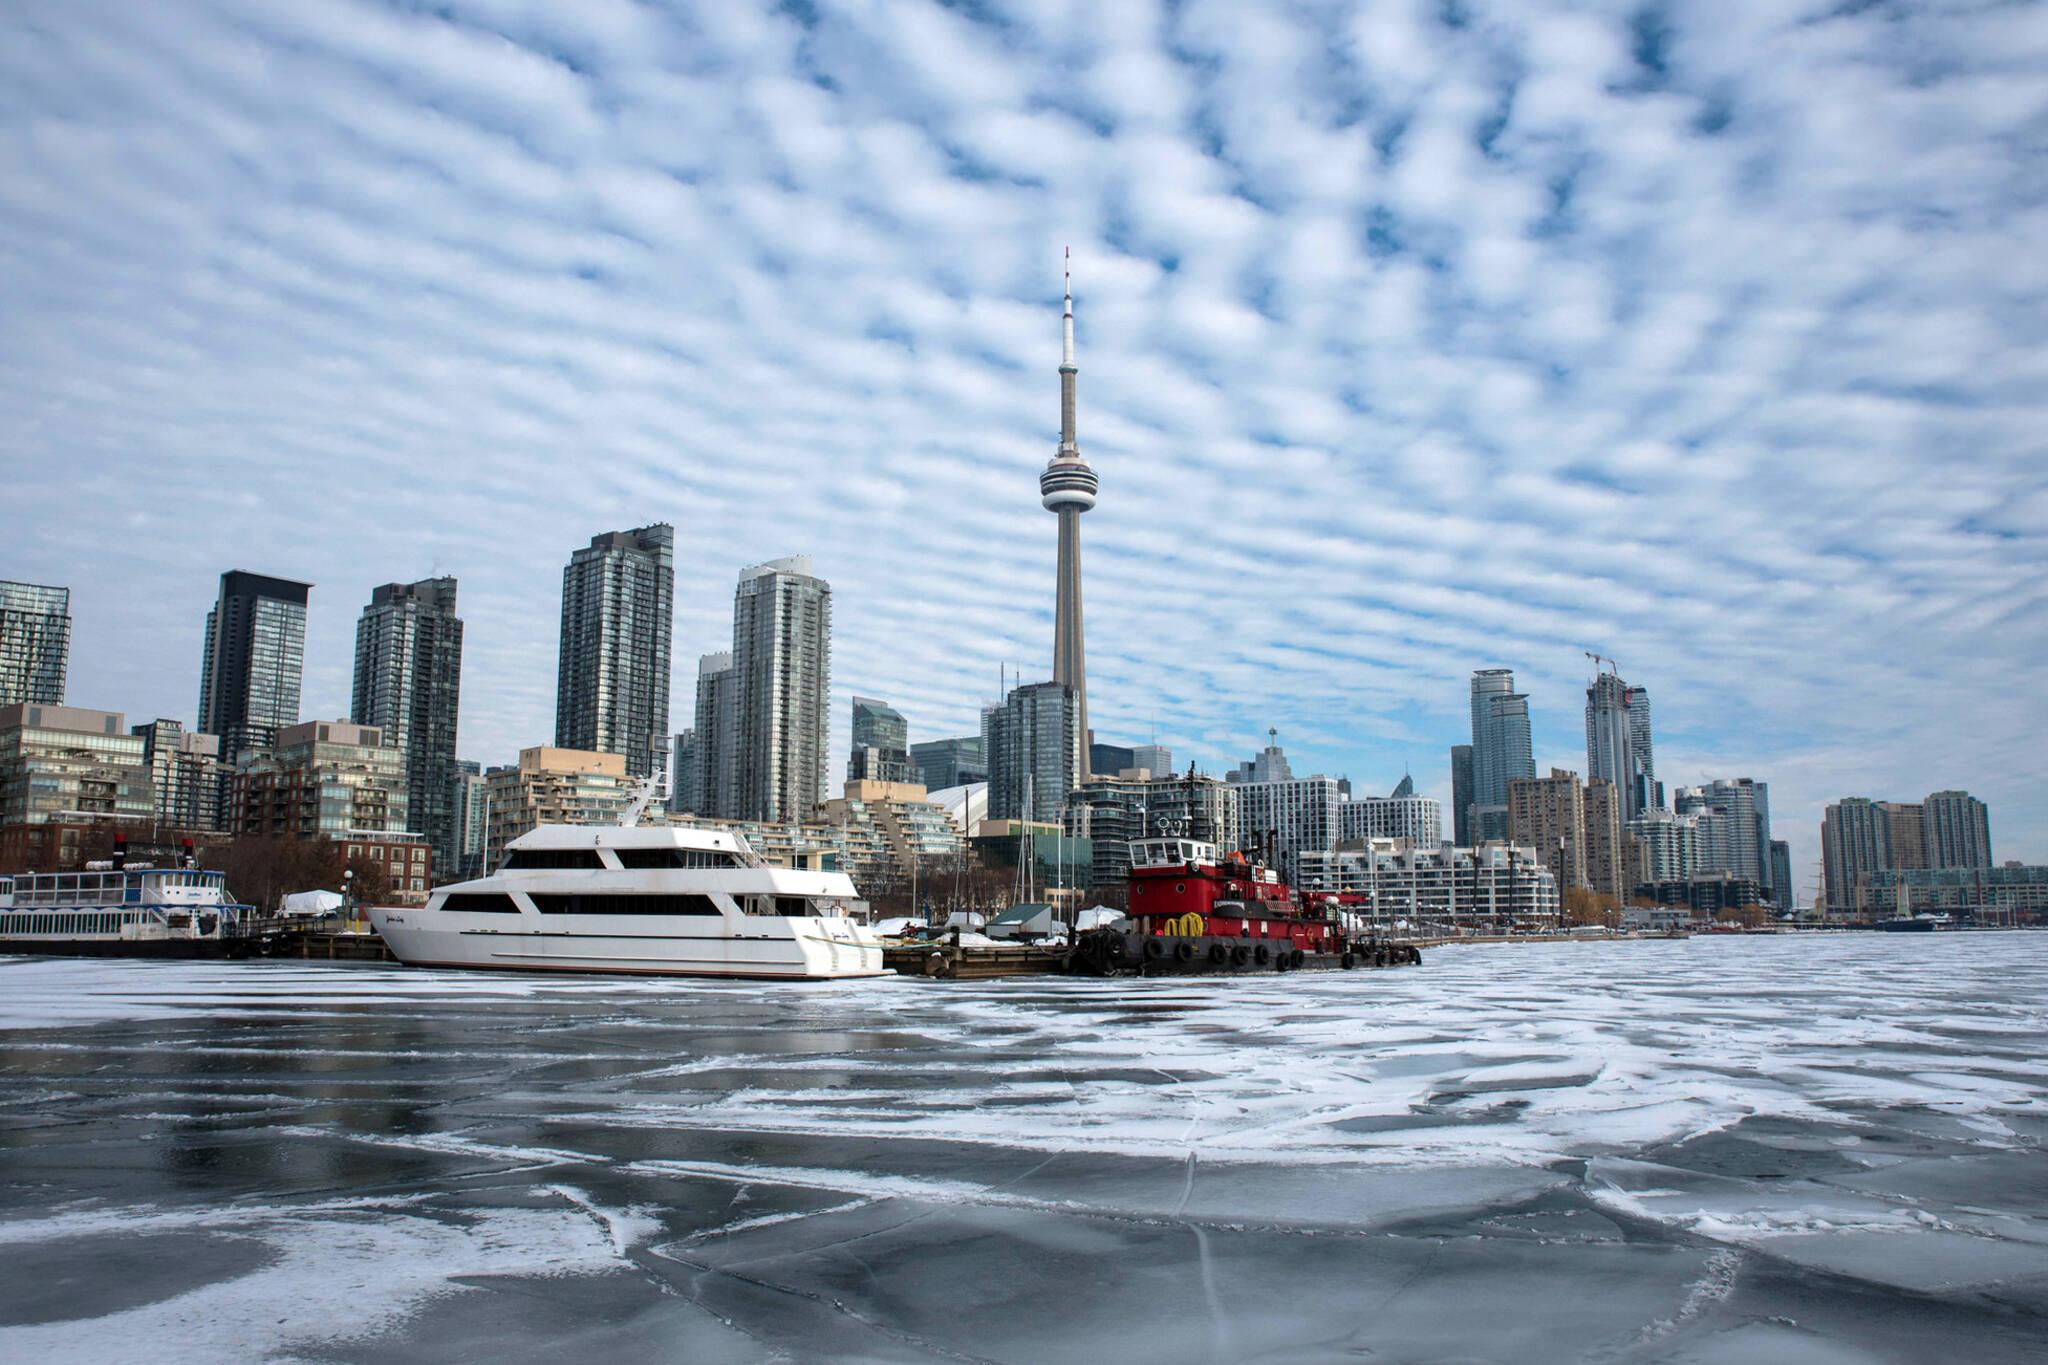 Toronto winter ice